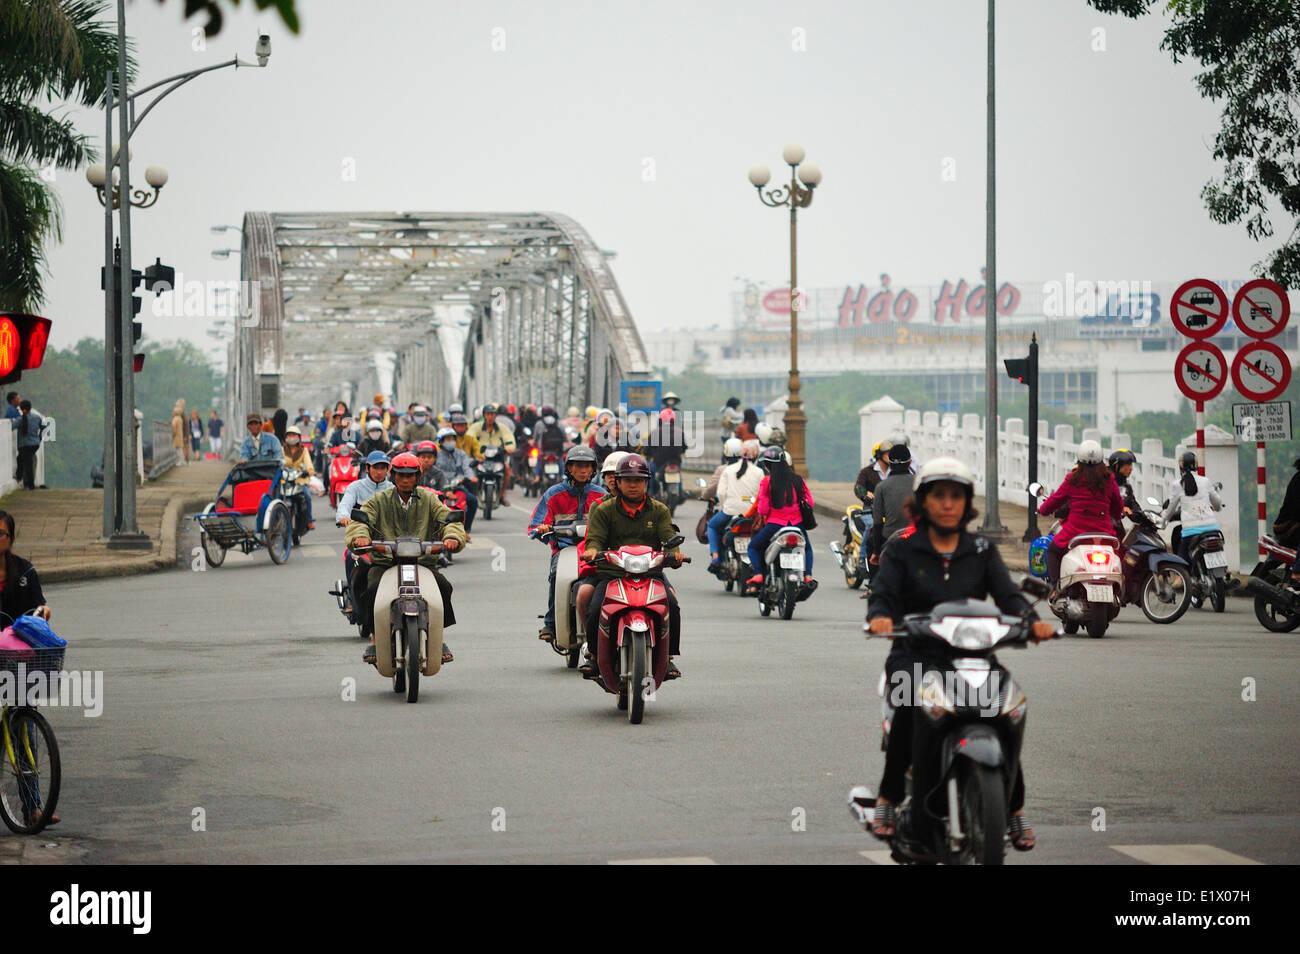 traffic at Trang Tien Bridge, Hue, Vietnam - Stock Image